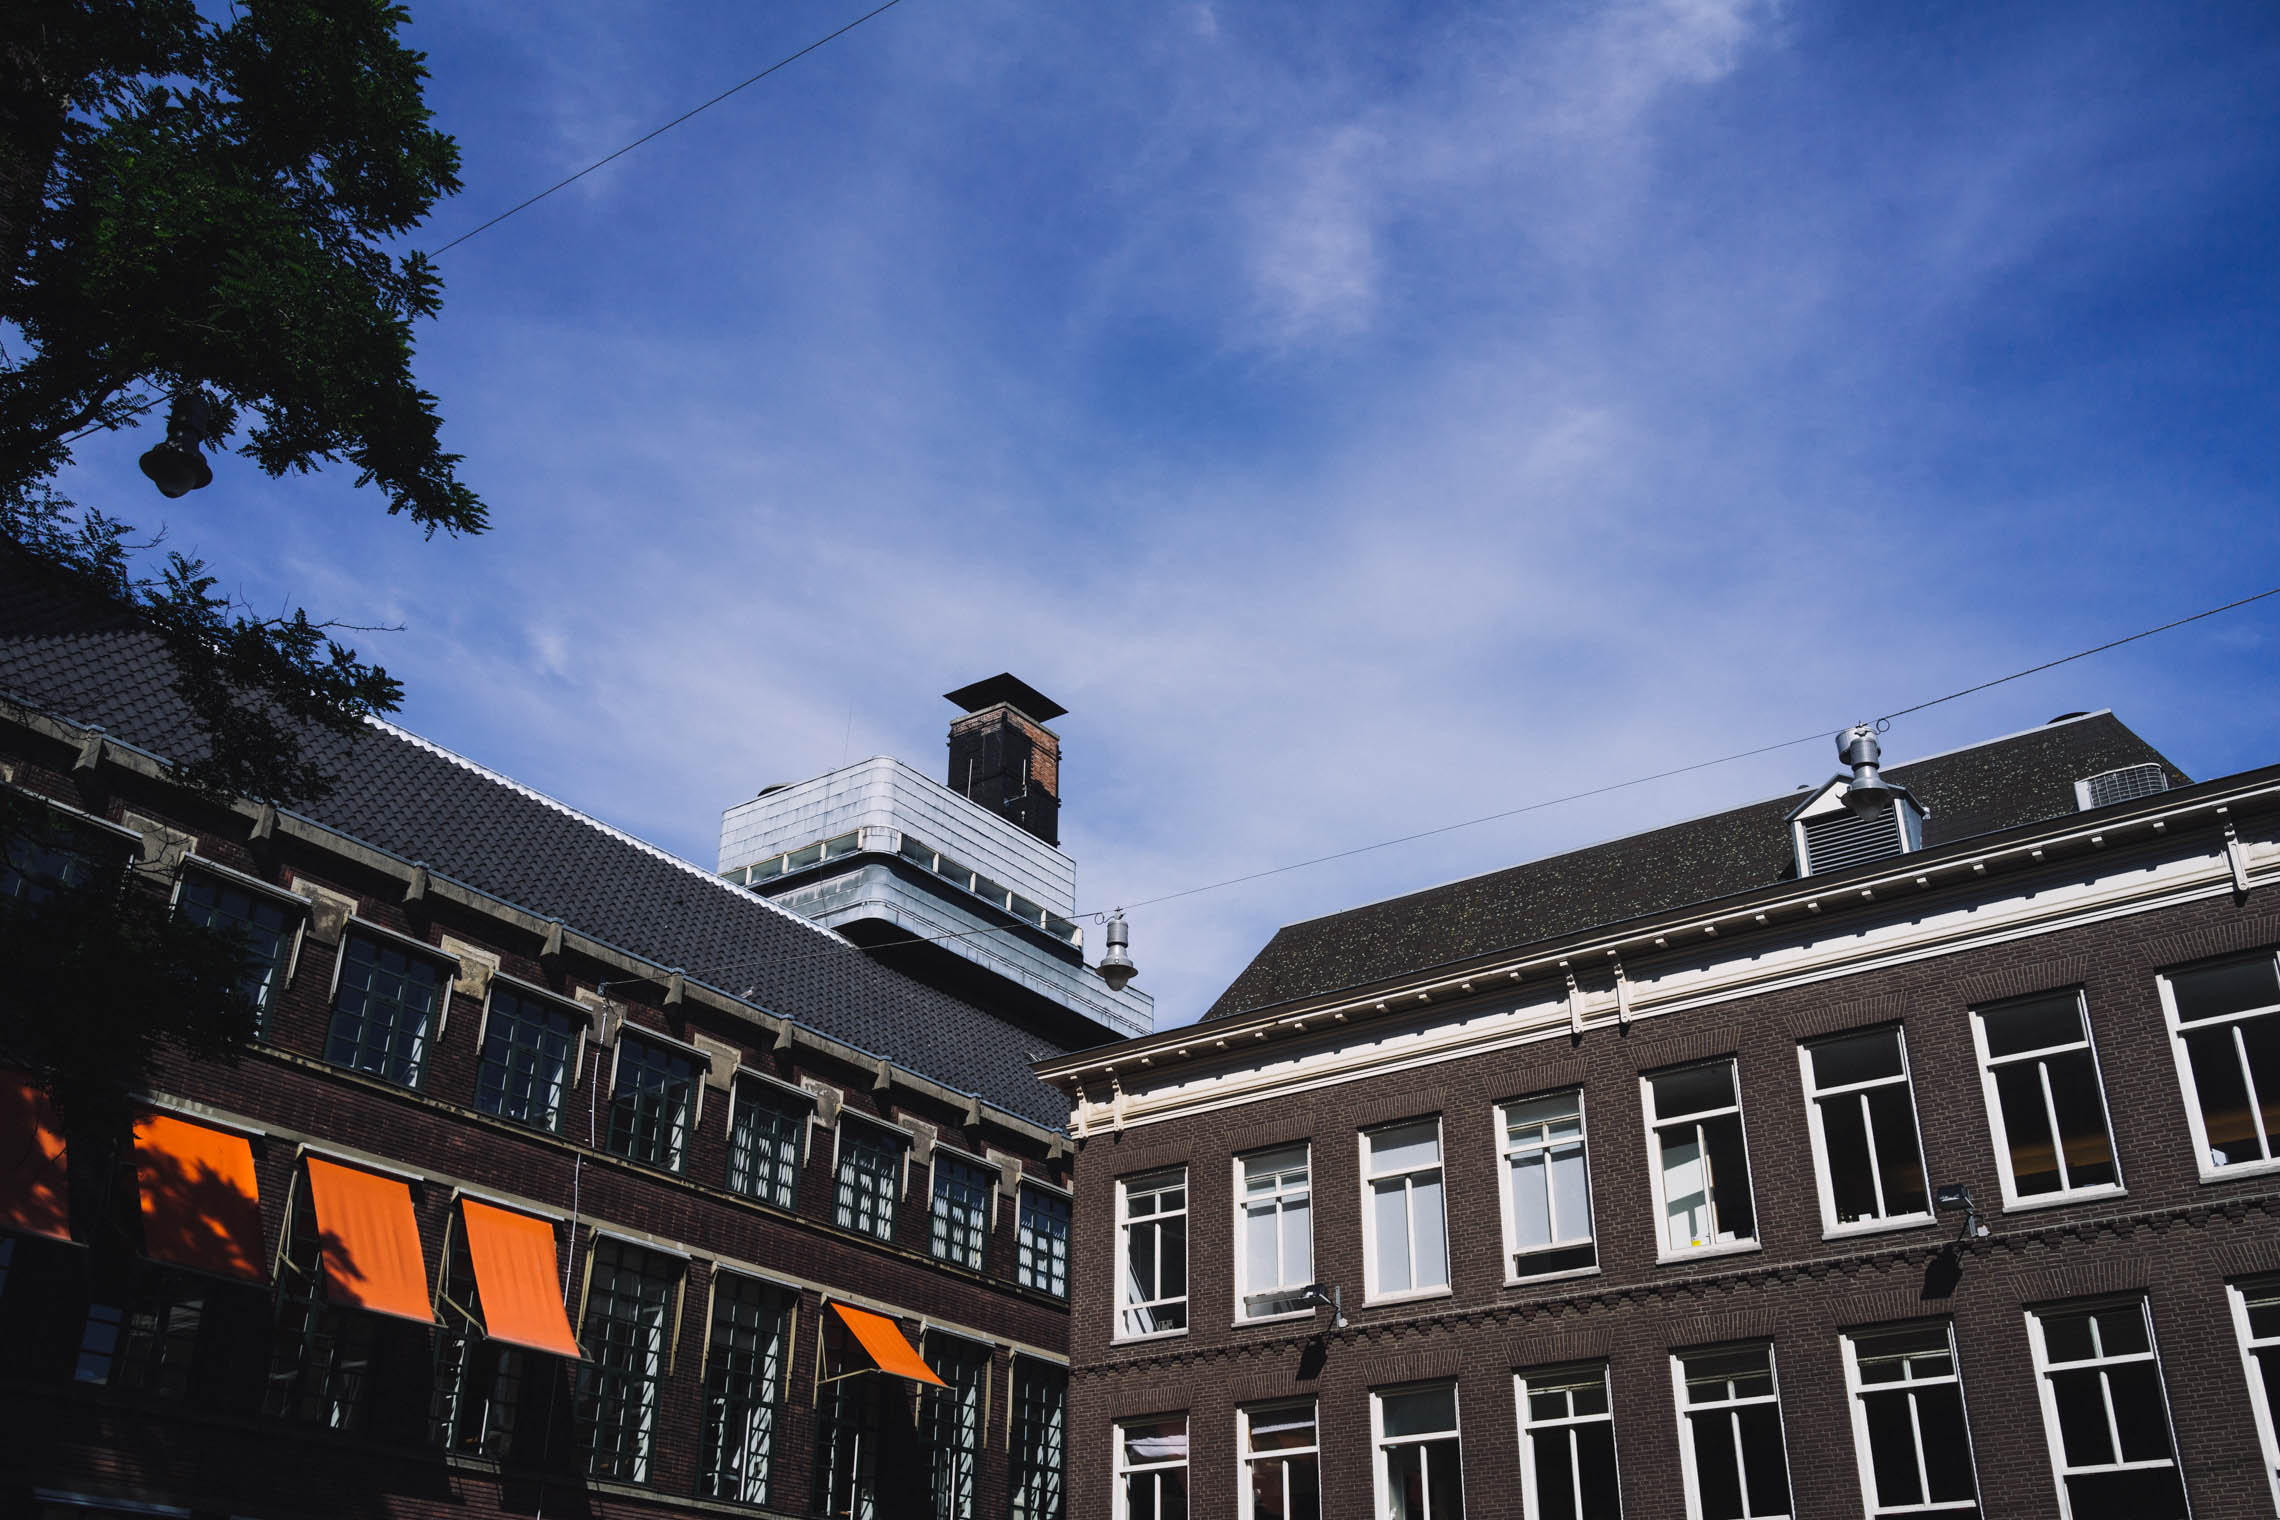 amsterdam-14@2x